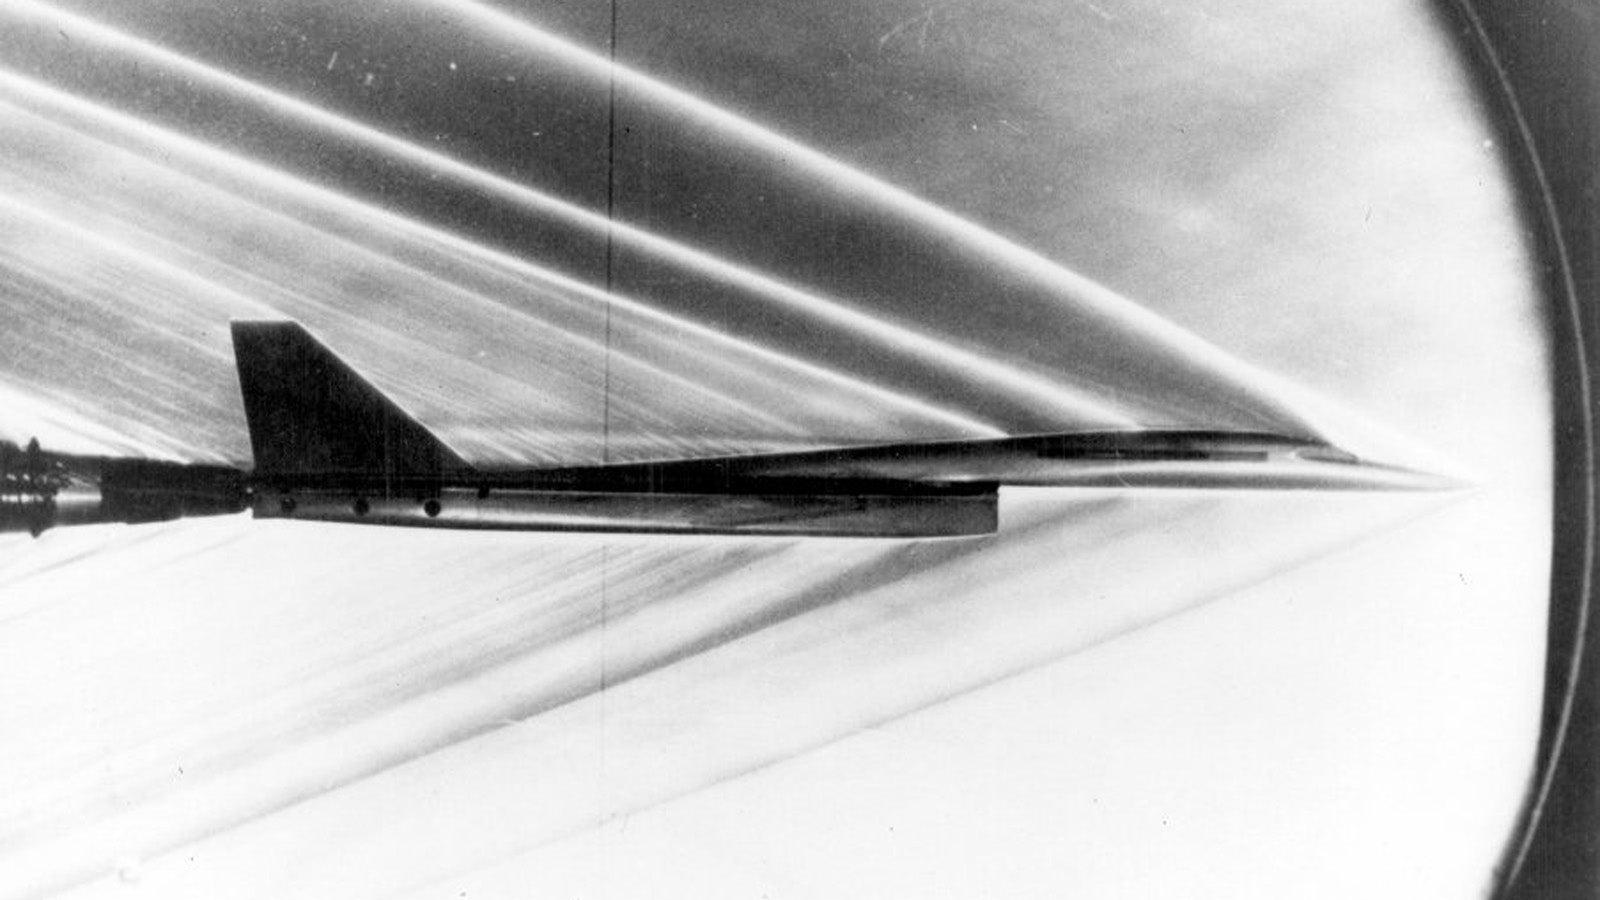 تونل باد مافوق صوت (۲)